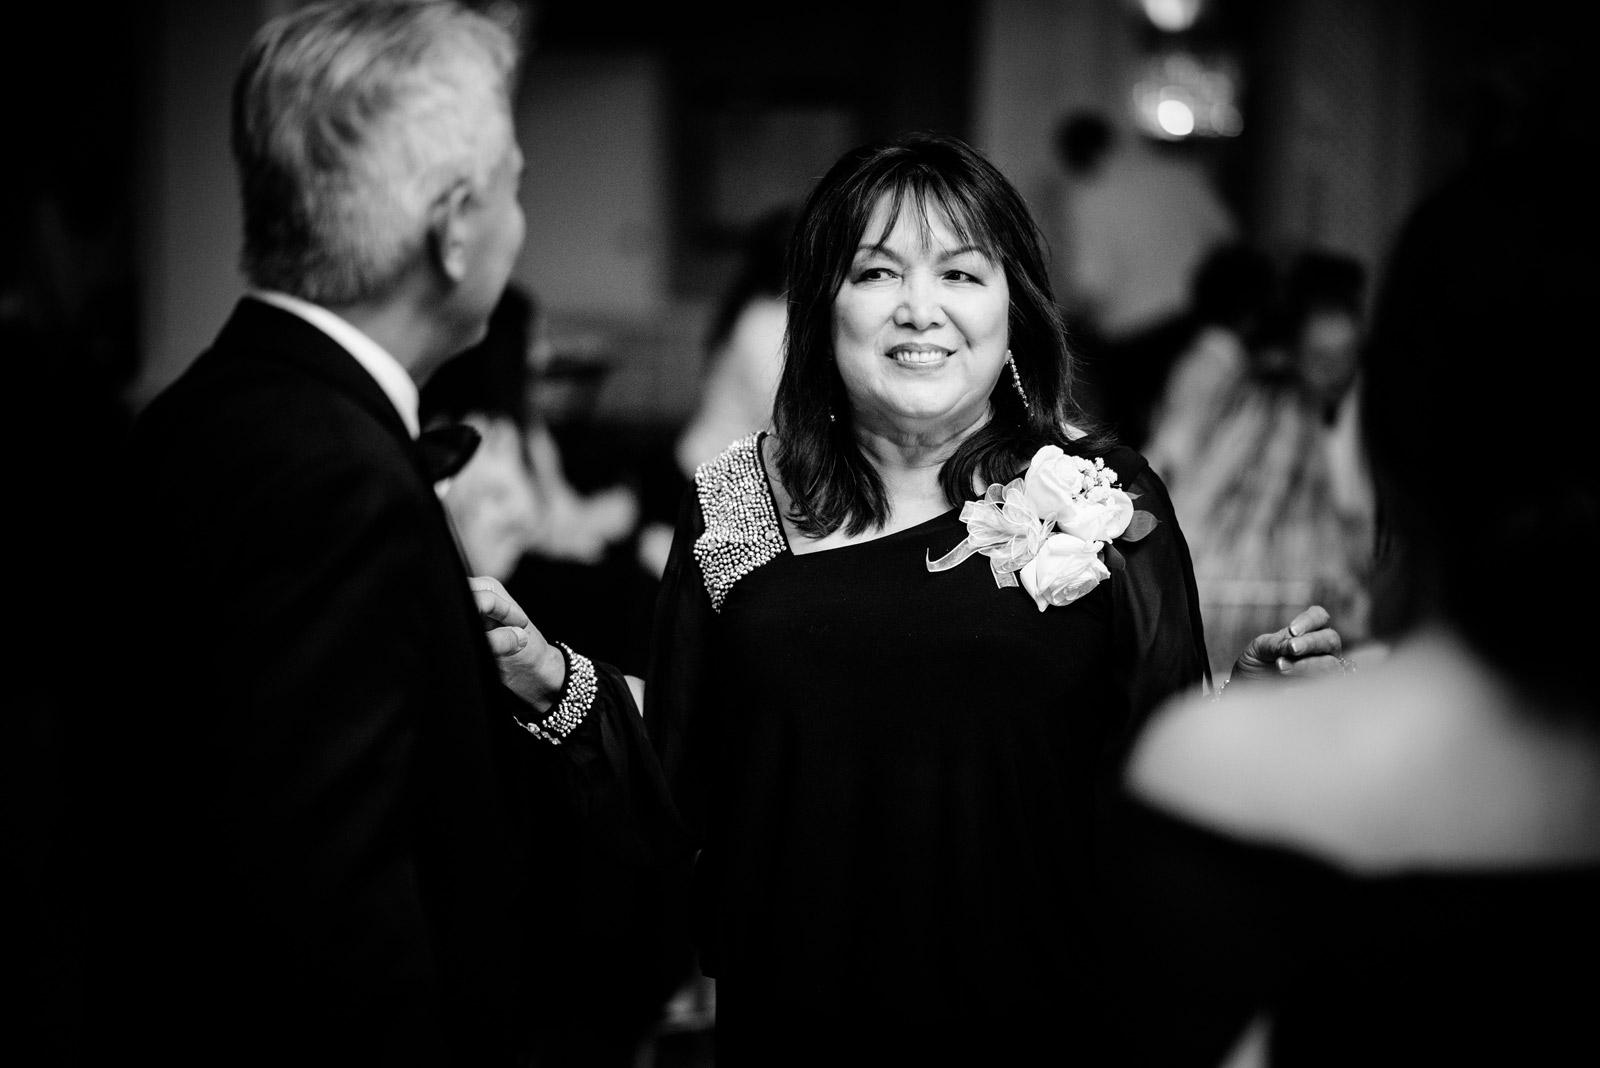 greenbrier resort cameo ballroom wedding reception